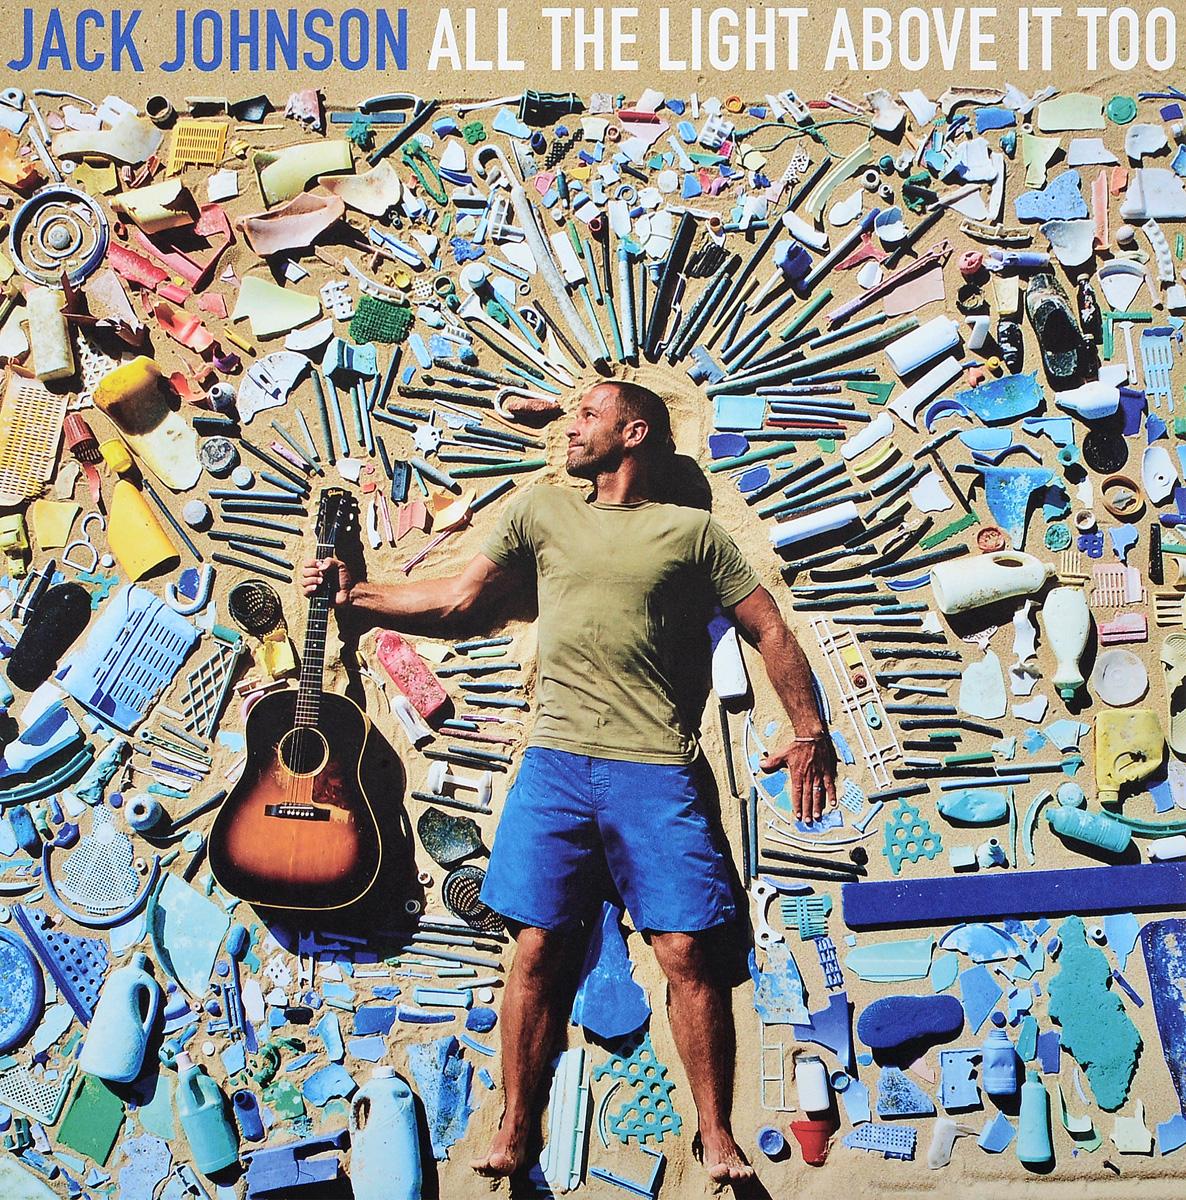 лучшая цена Джек Джонсон Jack Johnson. All The Light Above It Too (LP)